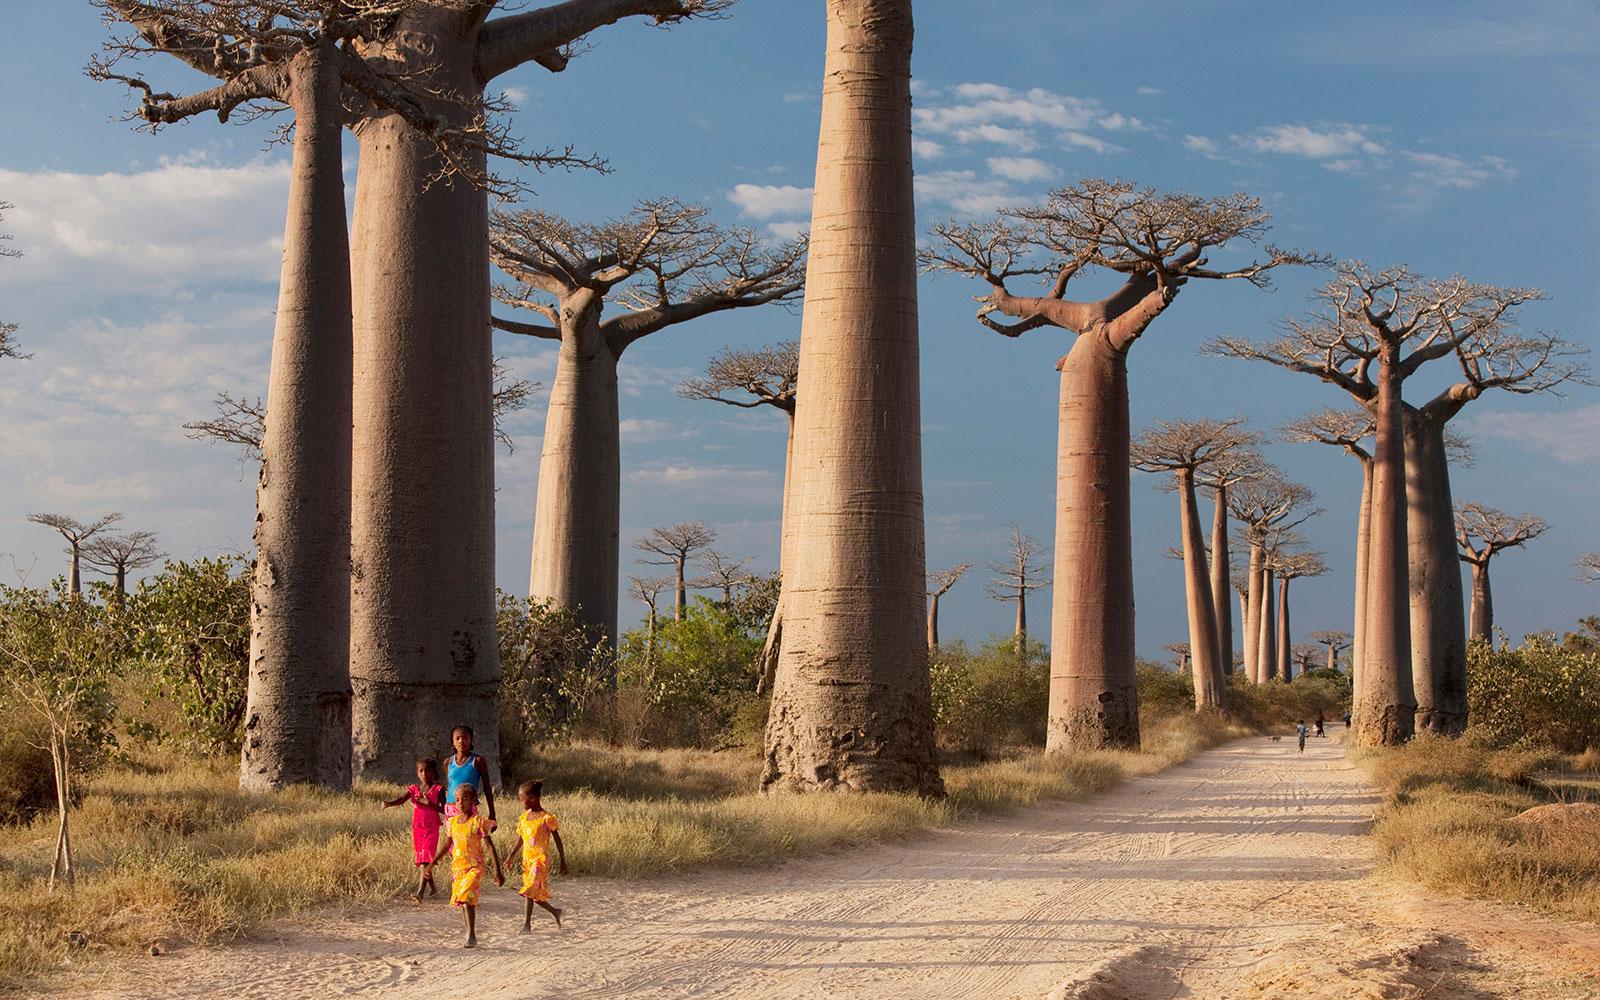 A group of young girls walk through Avenue of the Baobabs, near Morondava, Madagascar